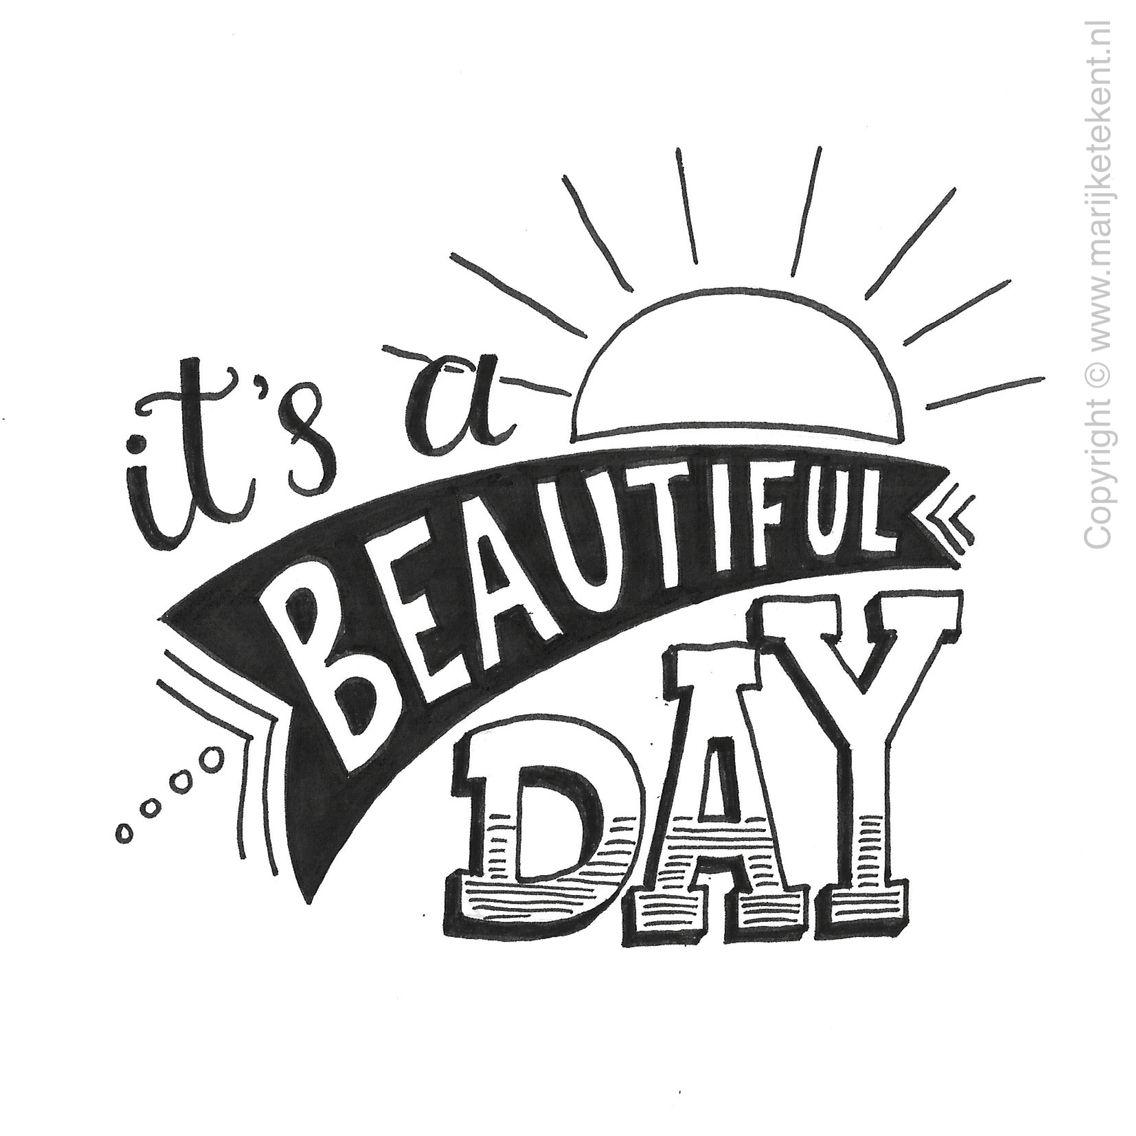 It's a beautiful day B&W